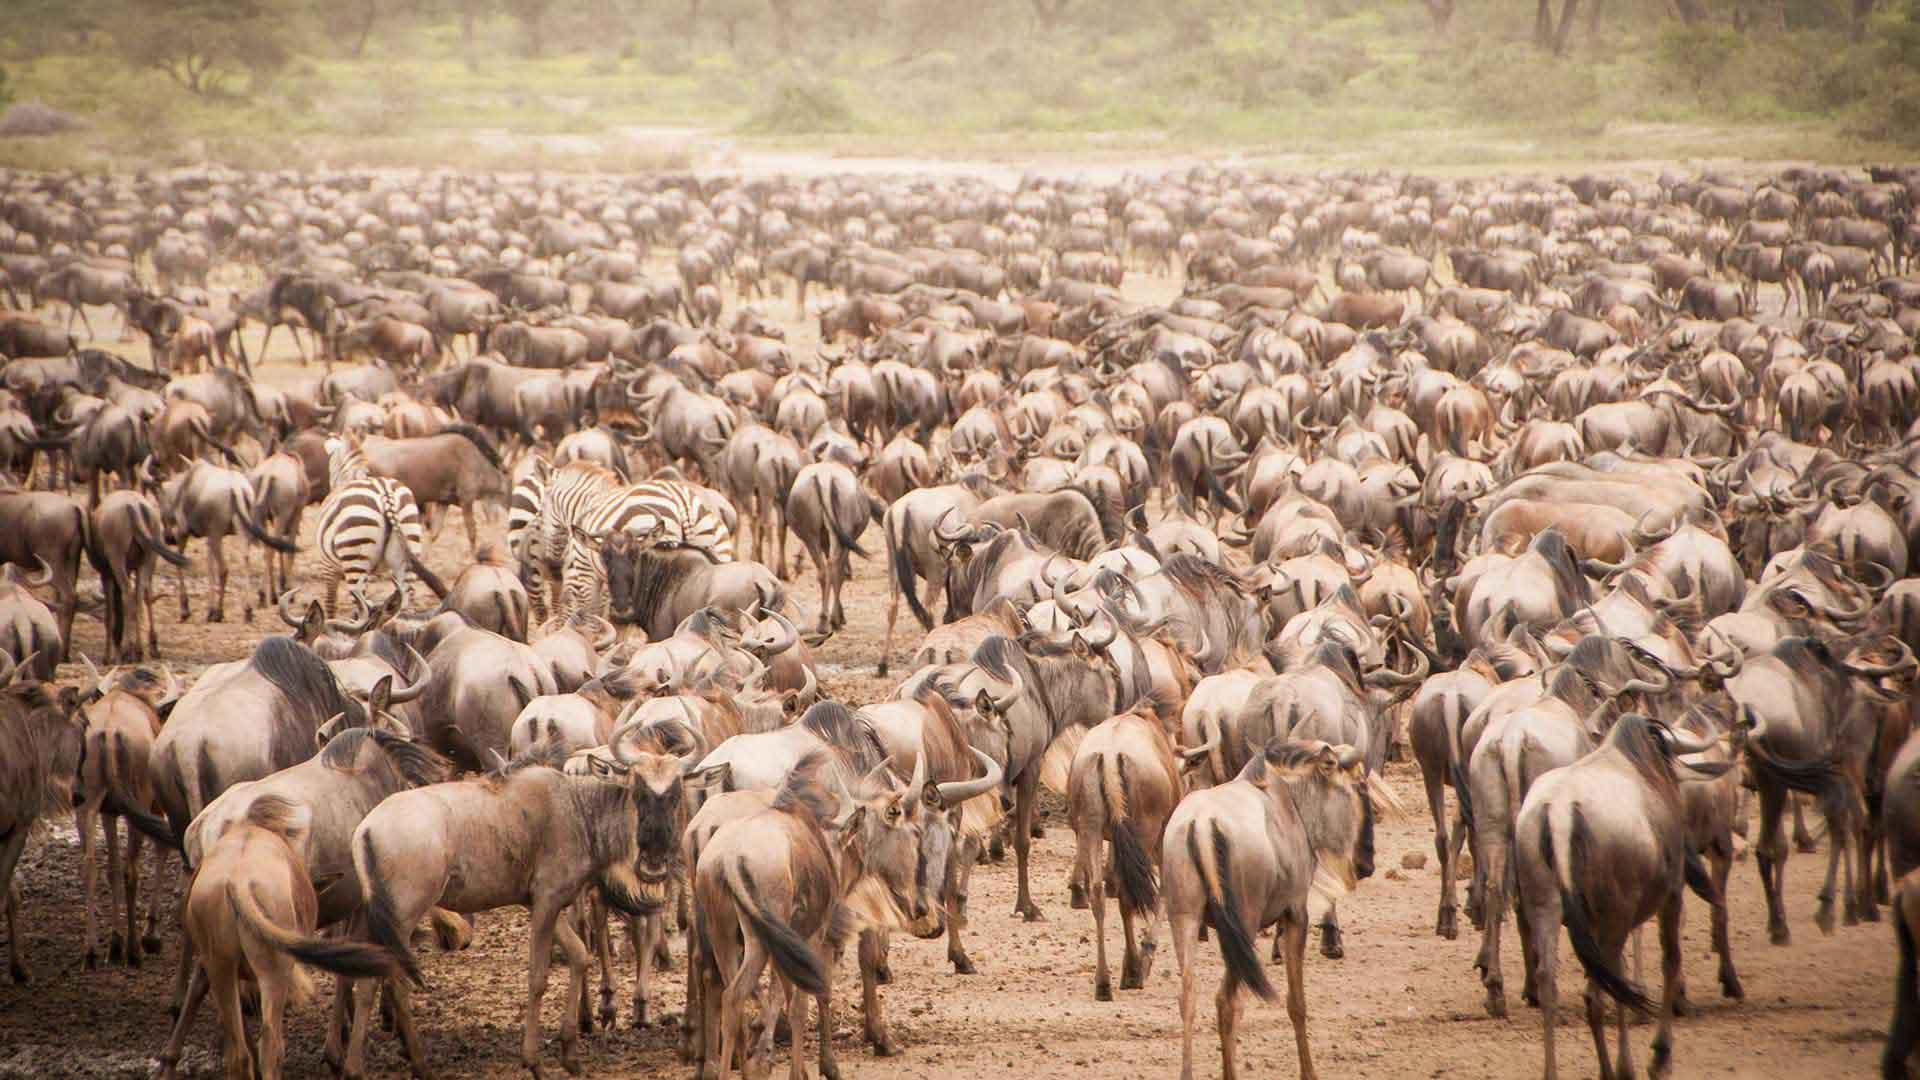 Serengeti The great migration